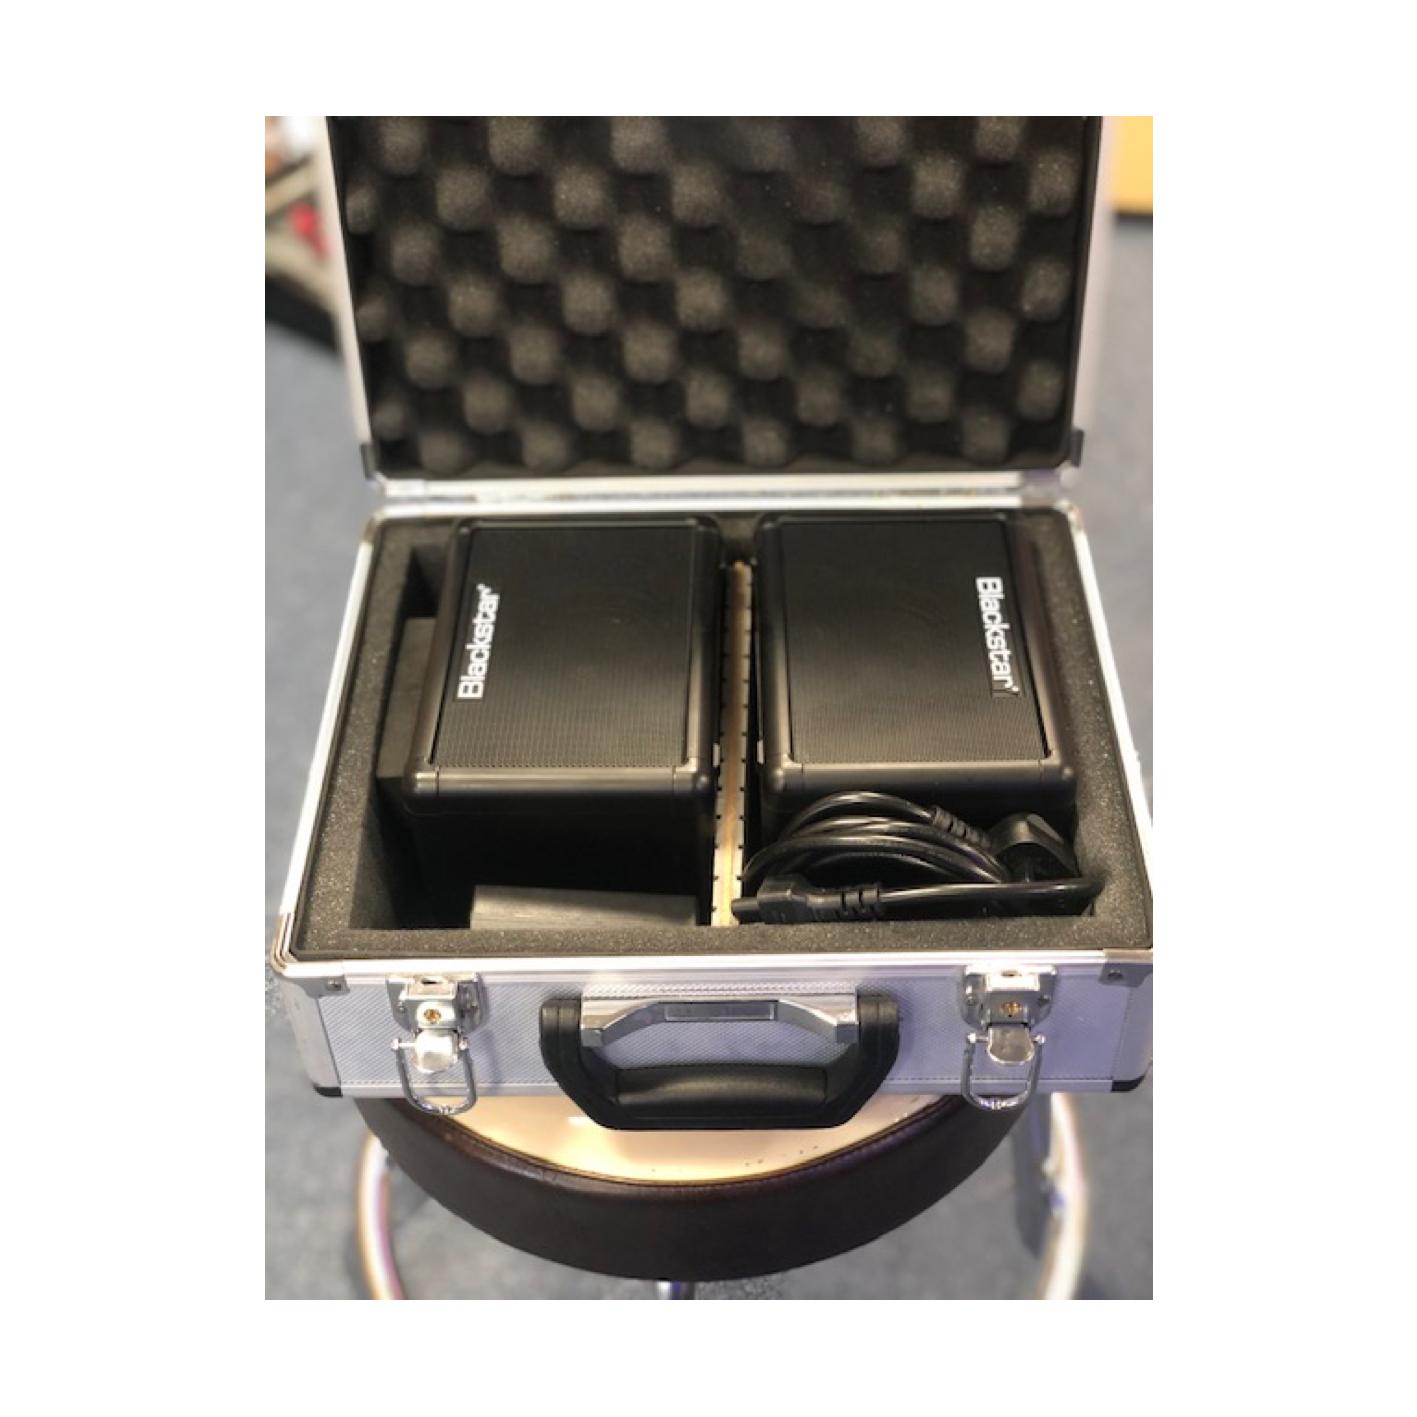 Blackstar Fly3 Stereo Pack w/ Custom Hard Case (Second Hand)